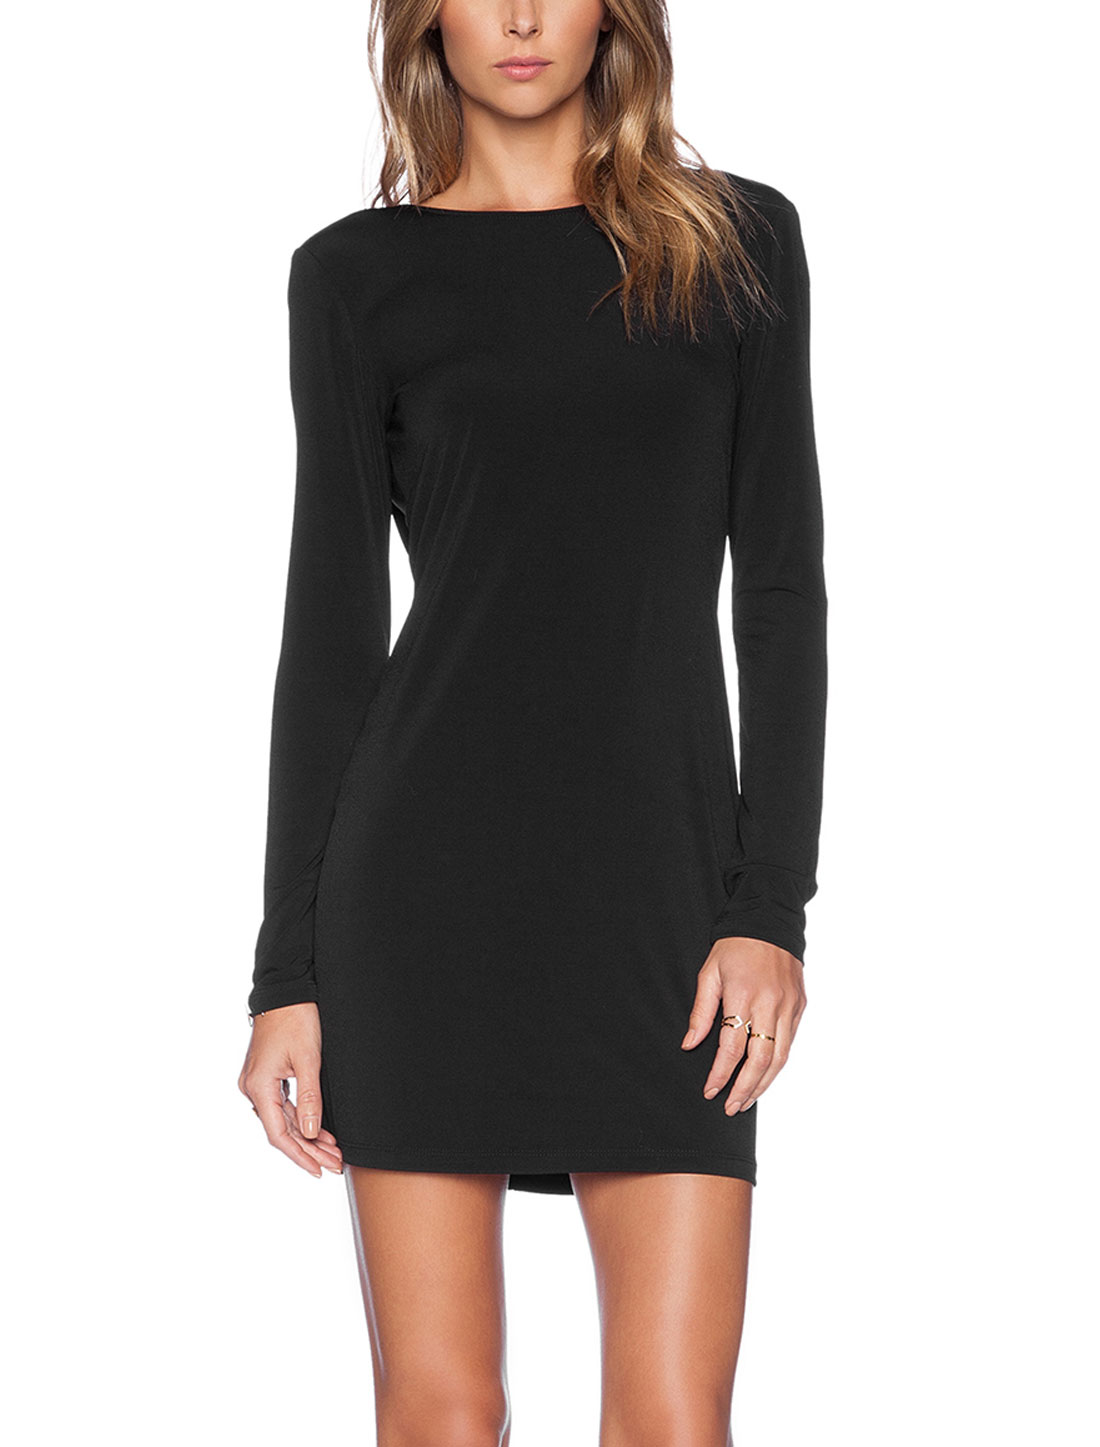 Woman Round Neck Long Sleeves Backless Slipover Sheath Dress Black M